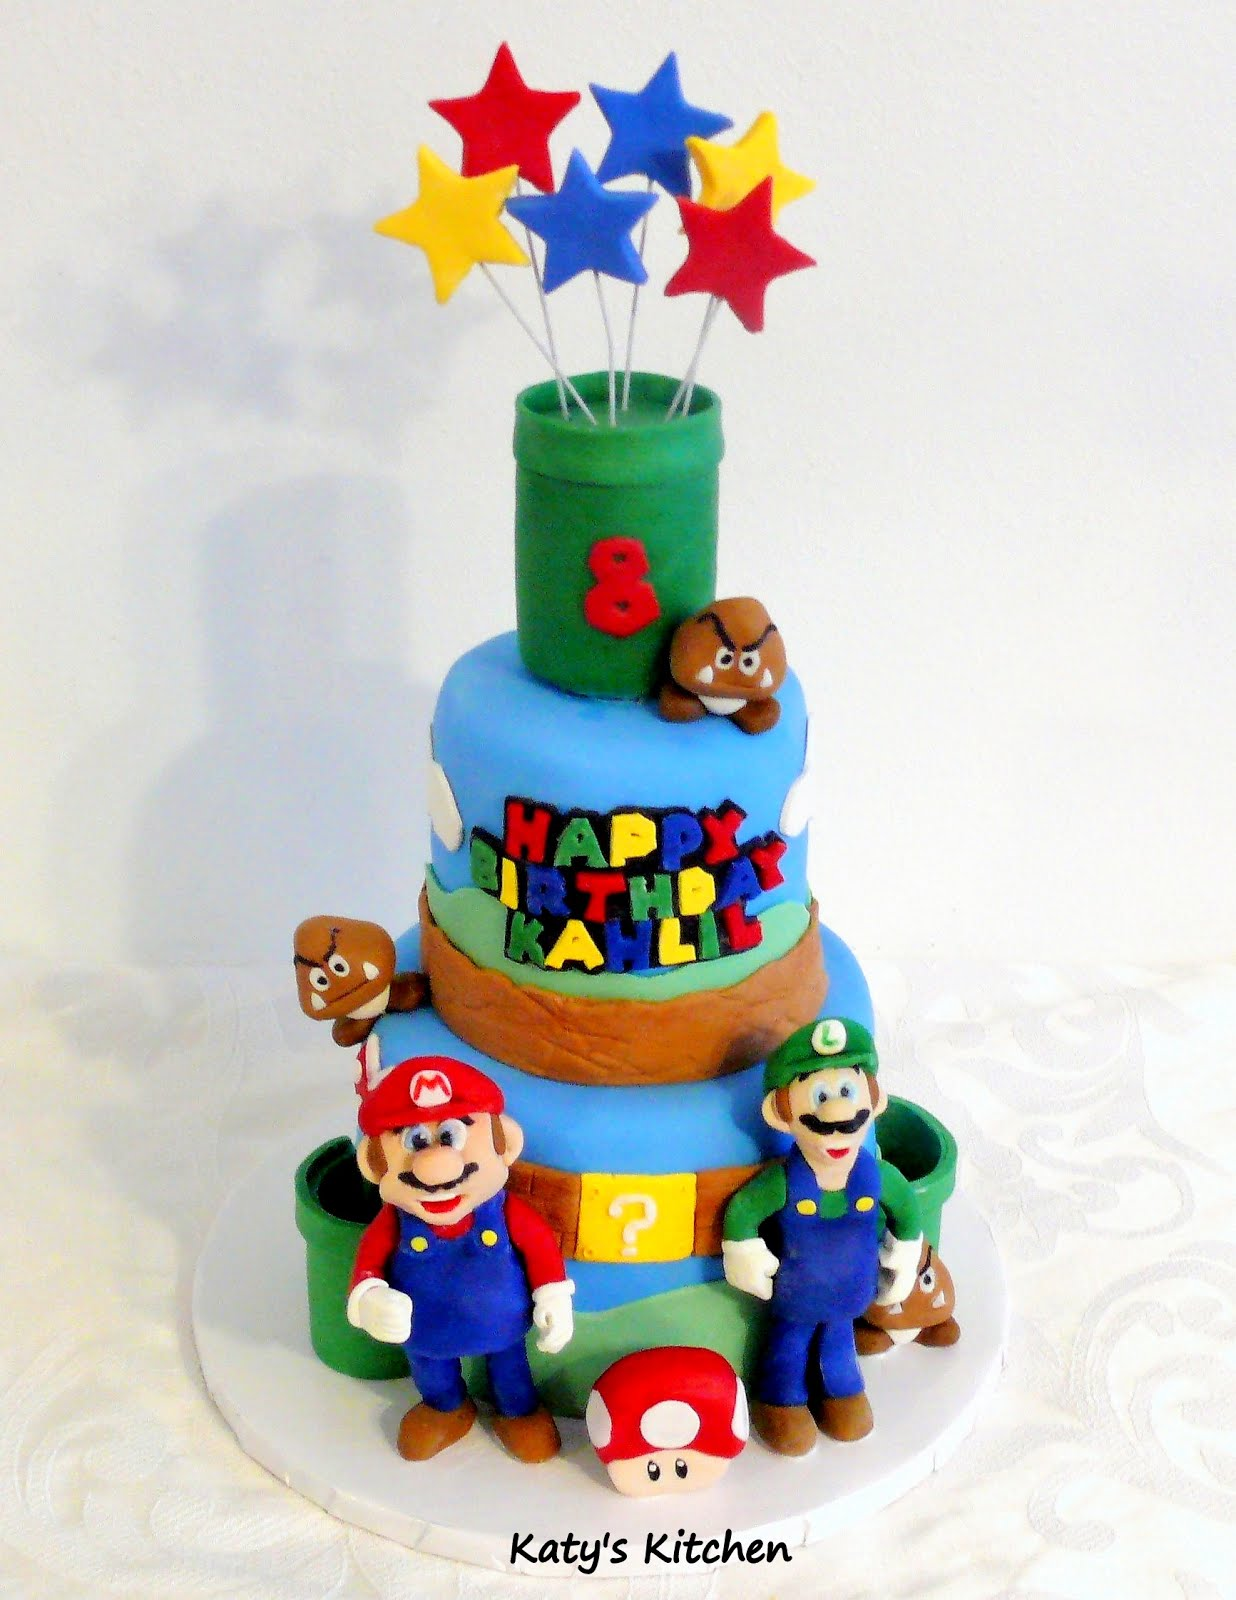 Outstanding Katys Kitchen Super Mario Birthday Cake Funny Birthday Cards Online Fluifree Goldxyz